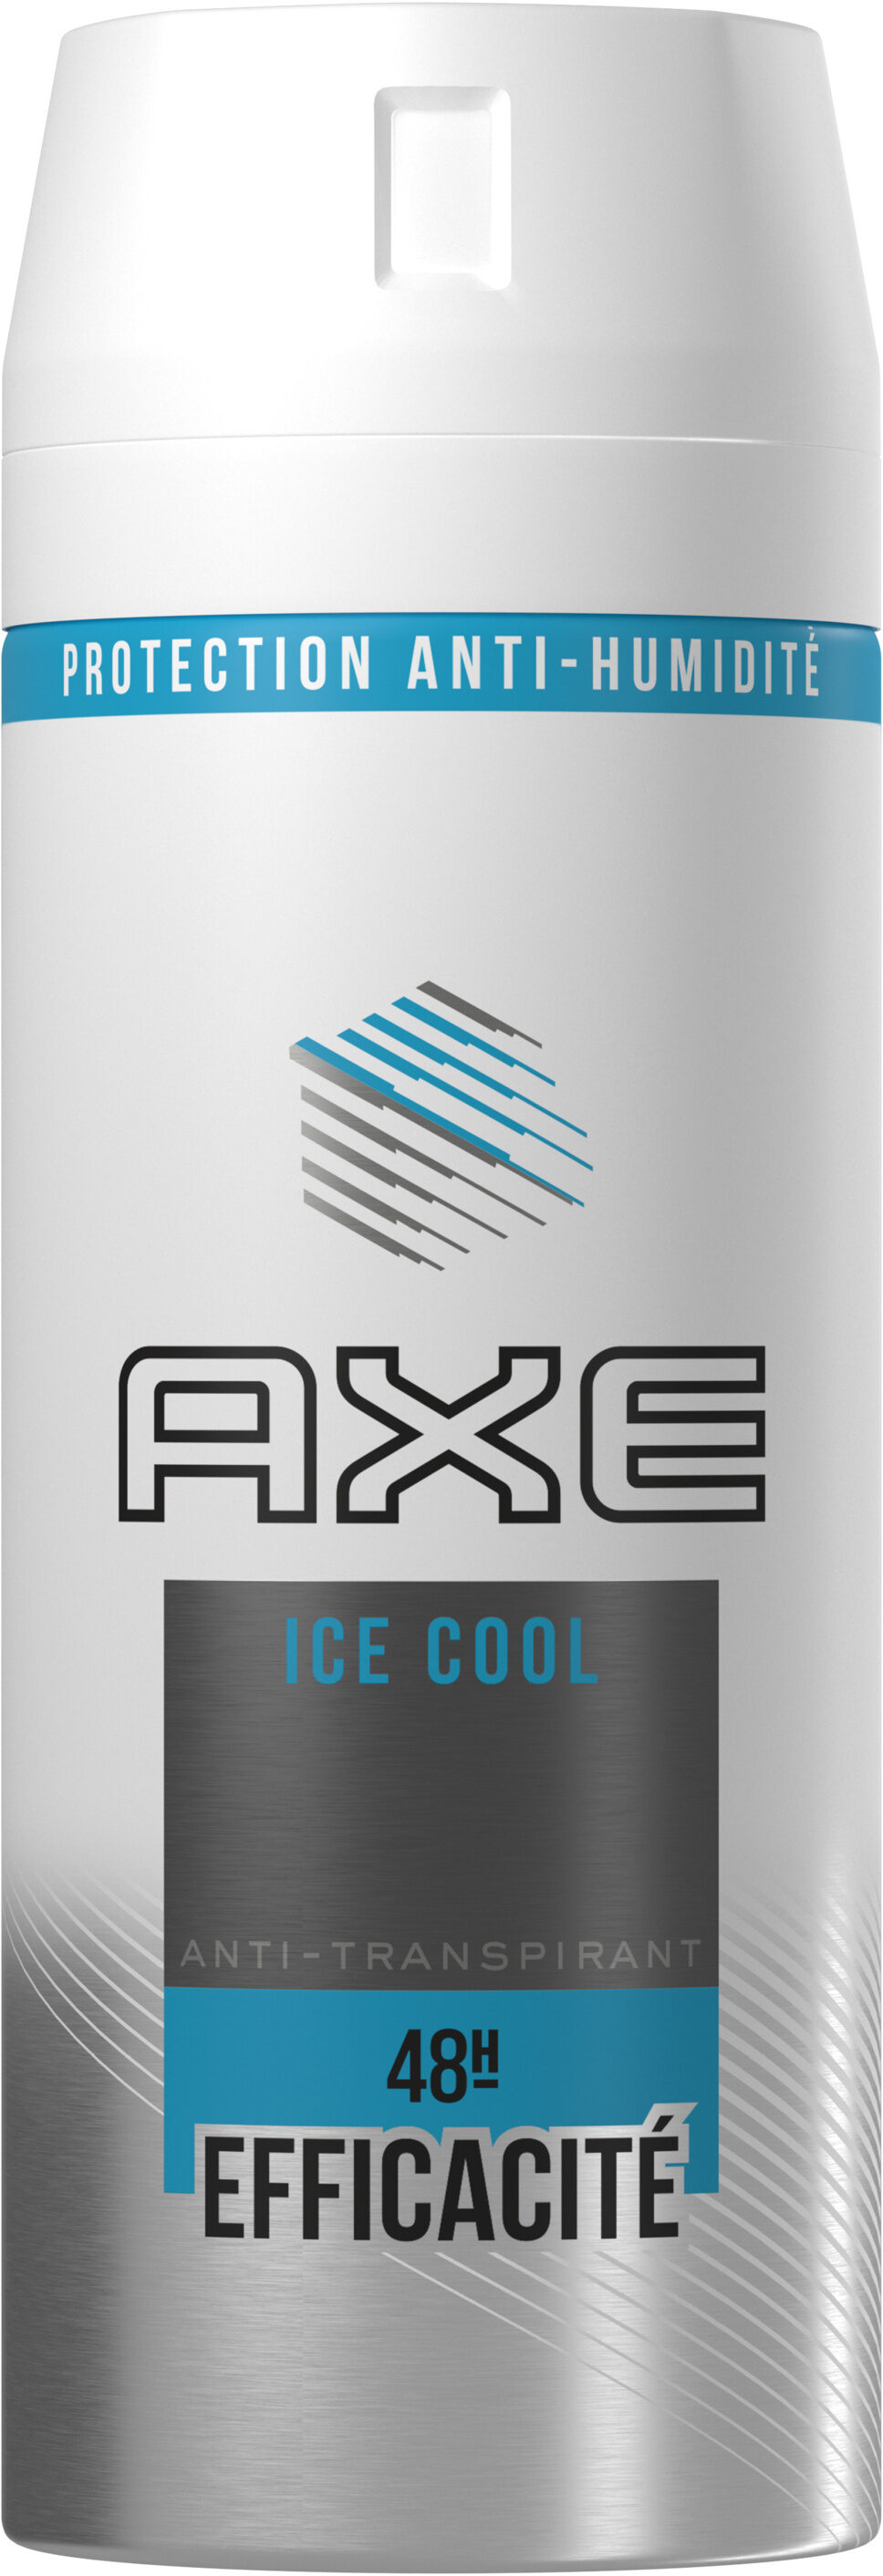 AXE Ice Cool Déodorant Homme Spray Antibactérien Menthe Glacial & Citron Protection Anti-Humidité 48H Spray - Product - fr